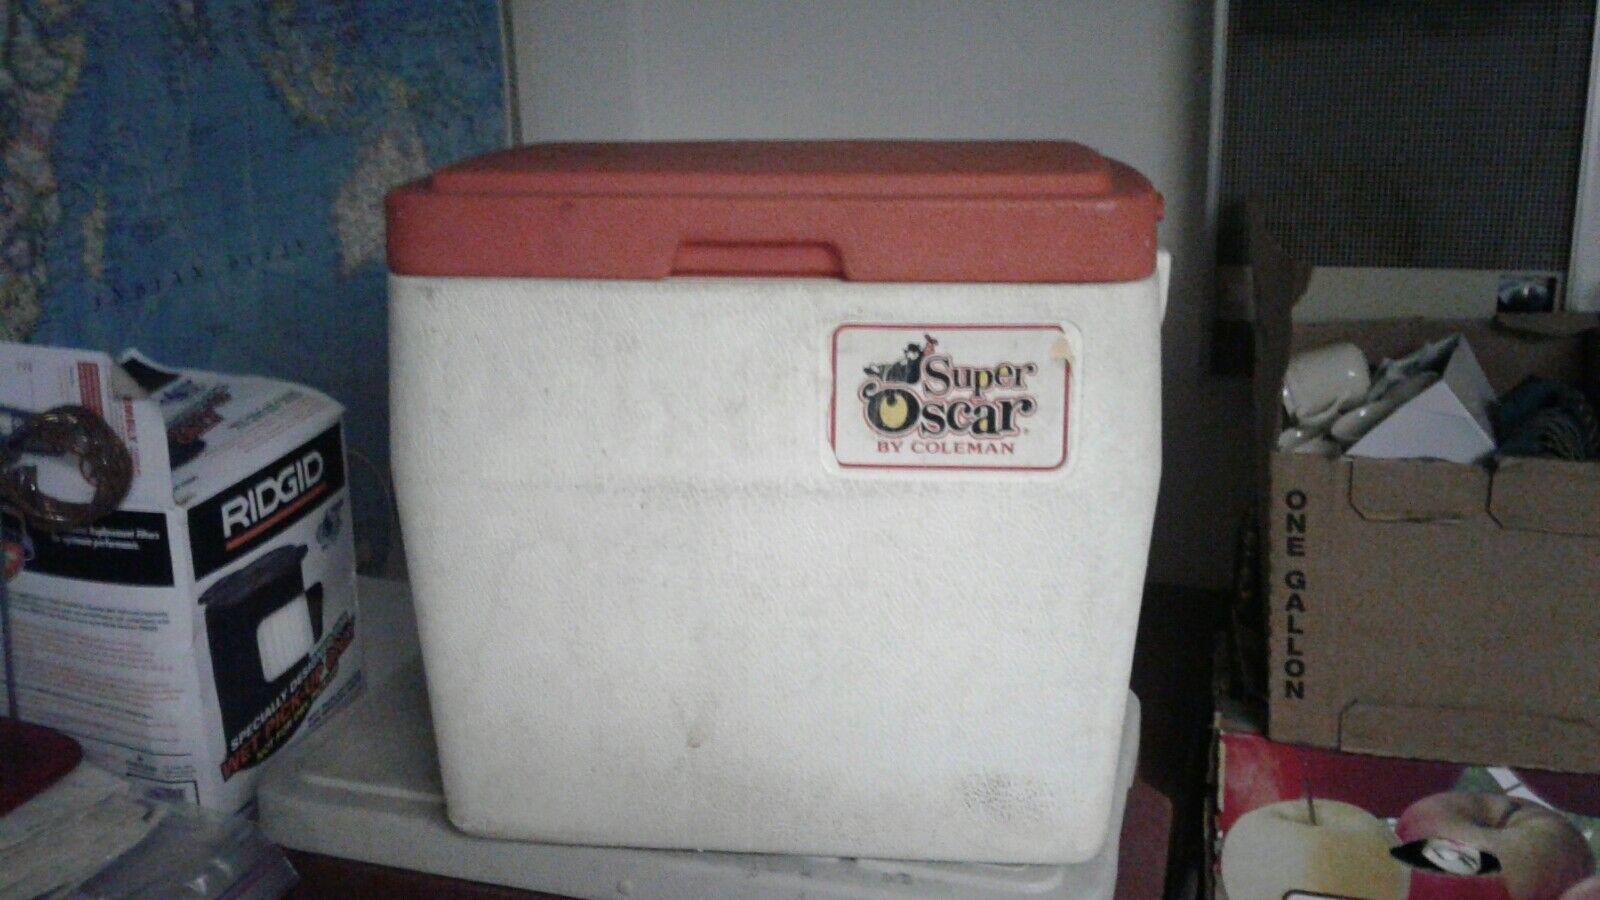 Vintage Coleman Super Oscar Cooler Red Lid Rare Six Gallon Size 1980s Fishing